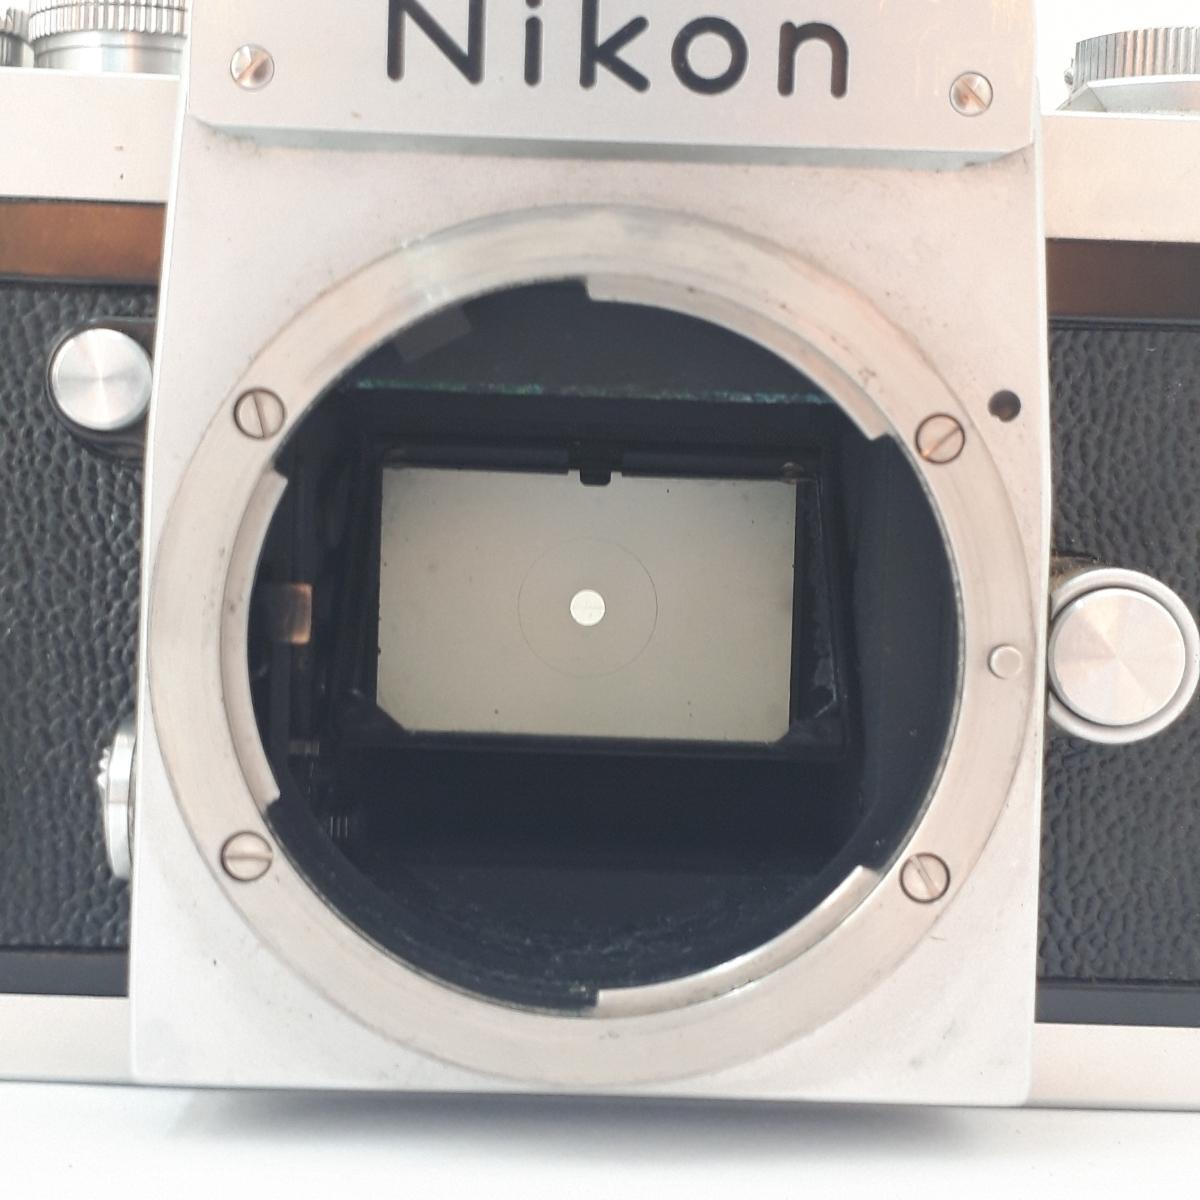 ★NIKON ニコン F NIKKOR-S 1:1.4 50mm 一眼レフカメラ レンズ★_画像9